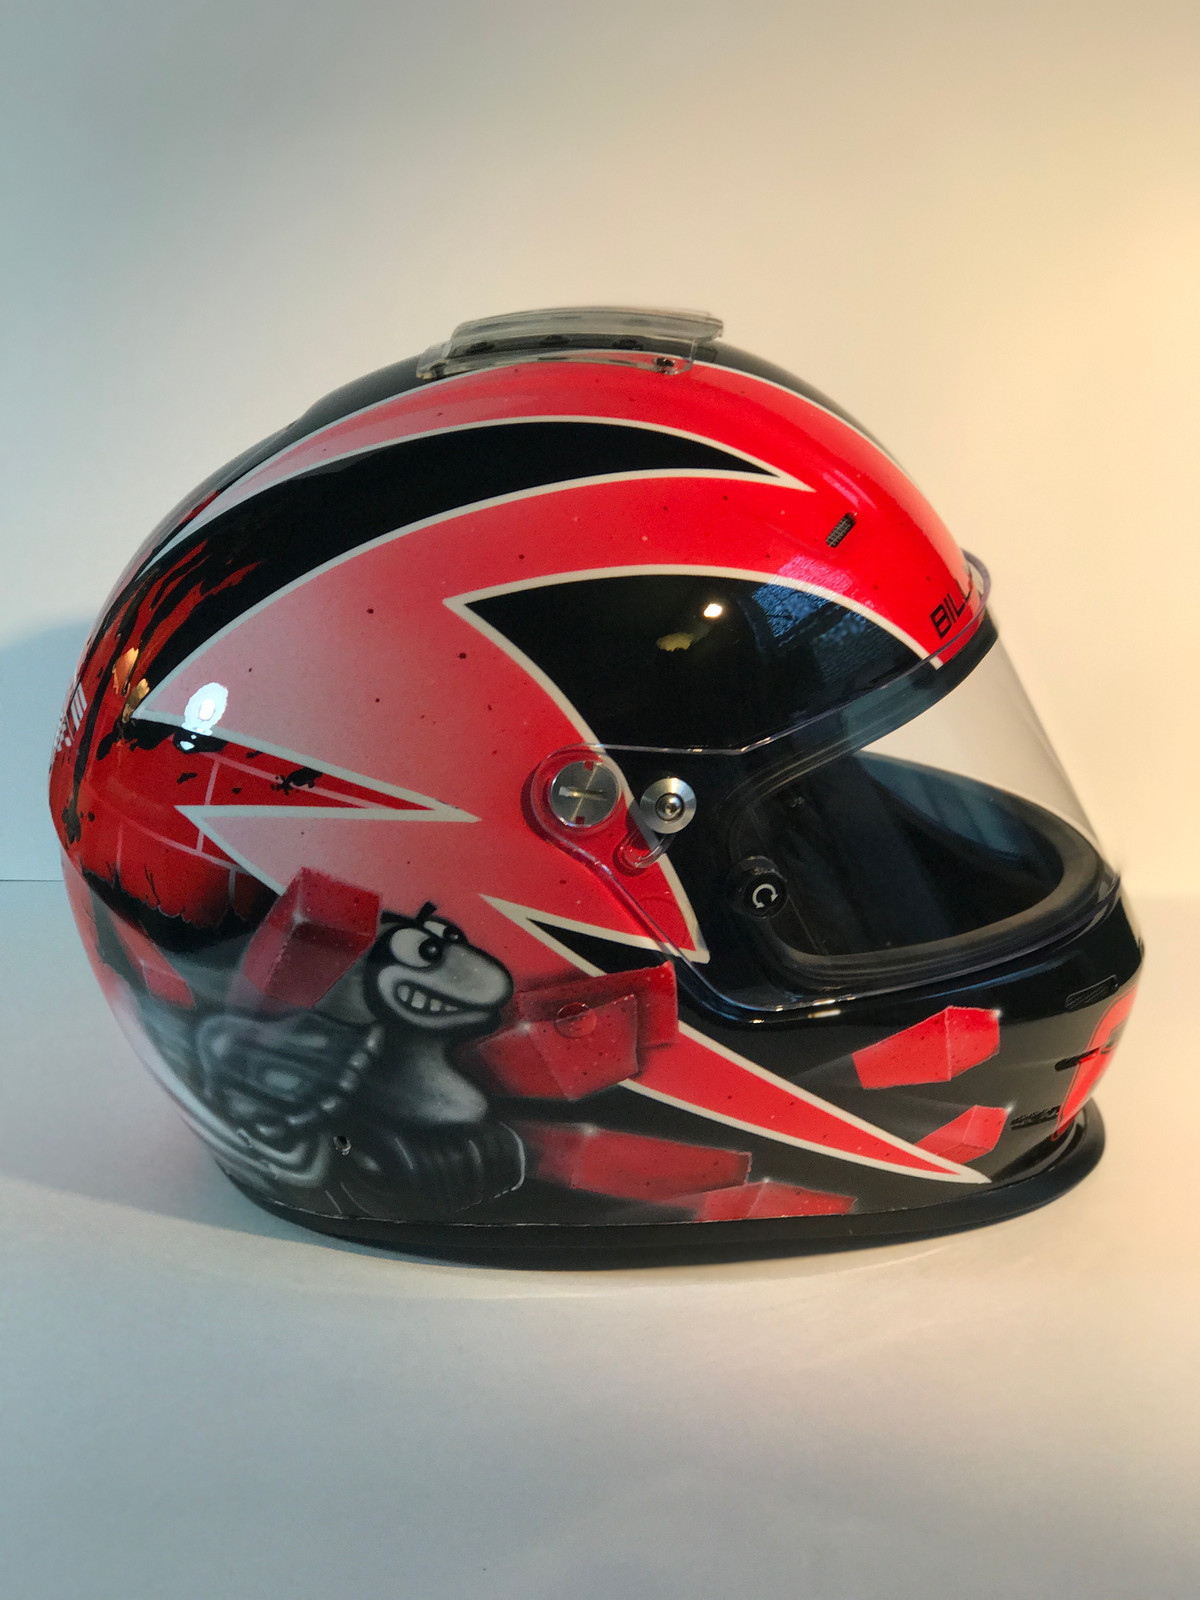 d7c6ec14b06f JPG  bugsbunny motorcycle helmet.jpg  IMG 3464.